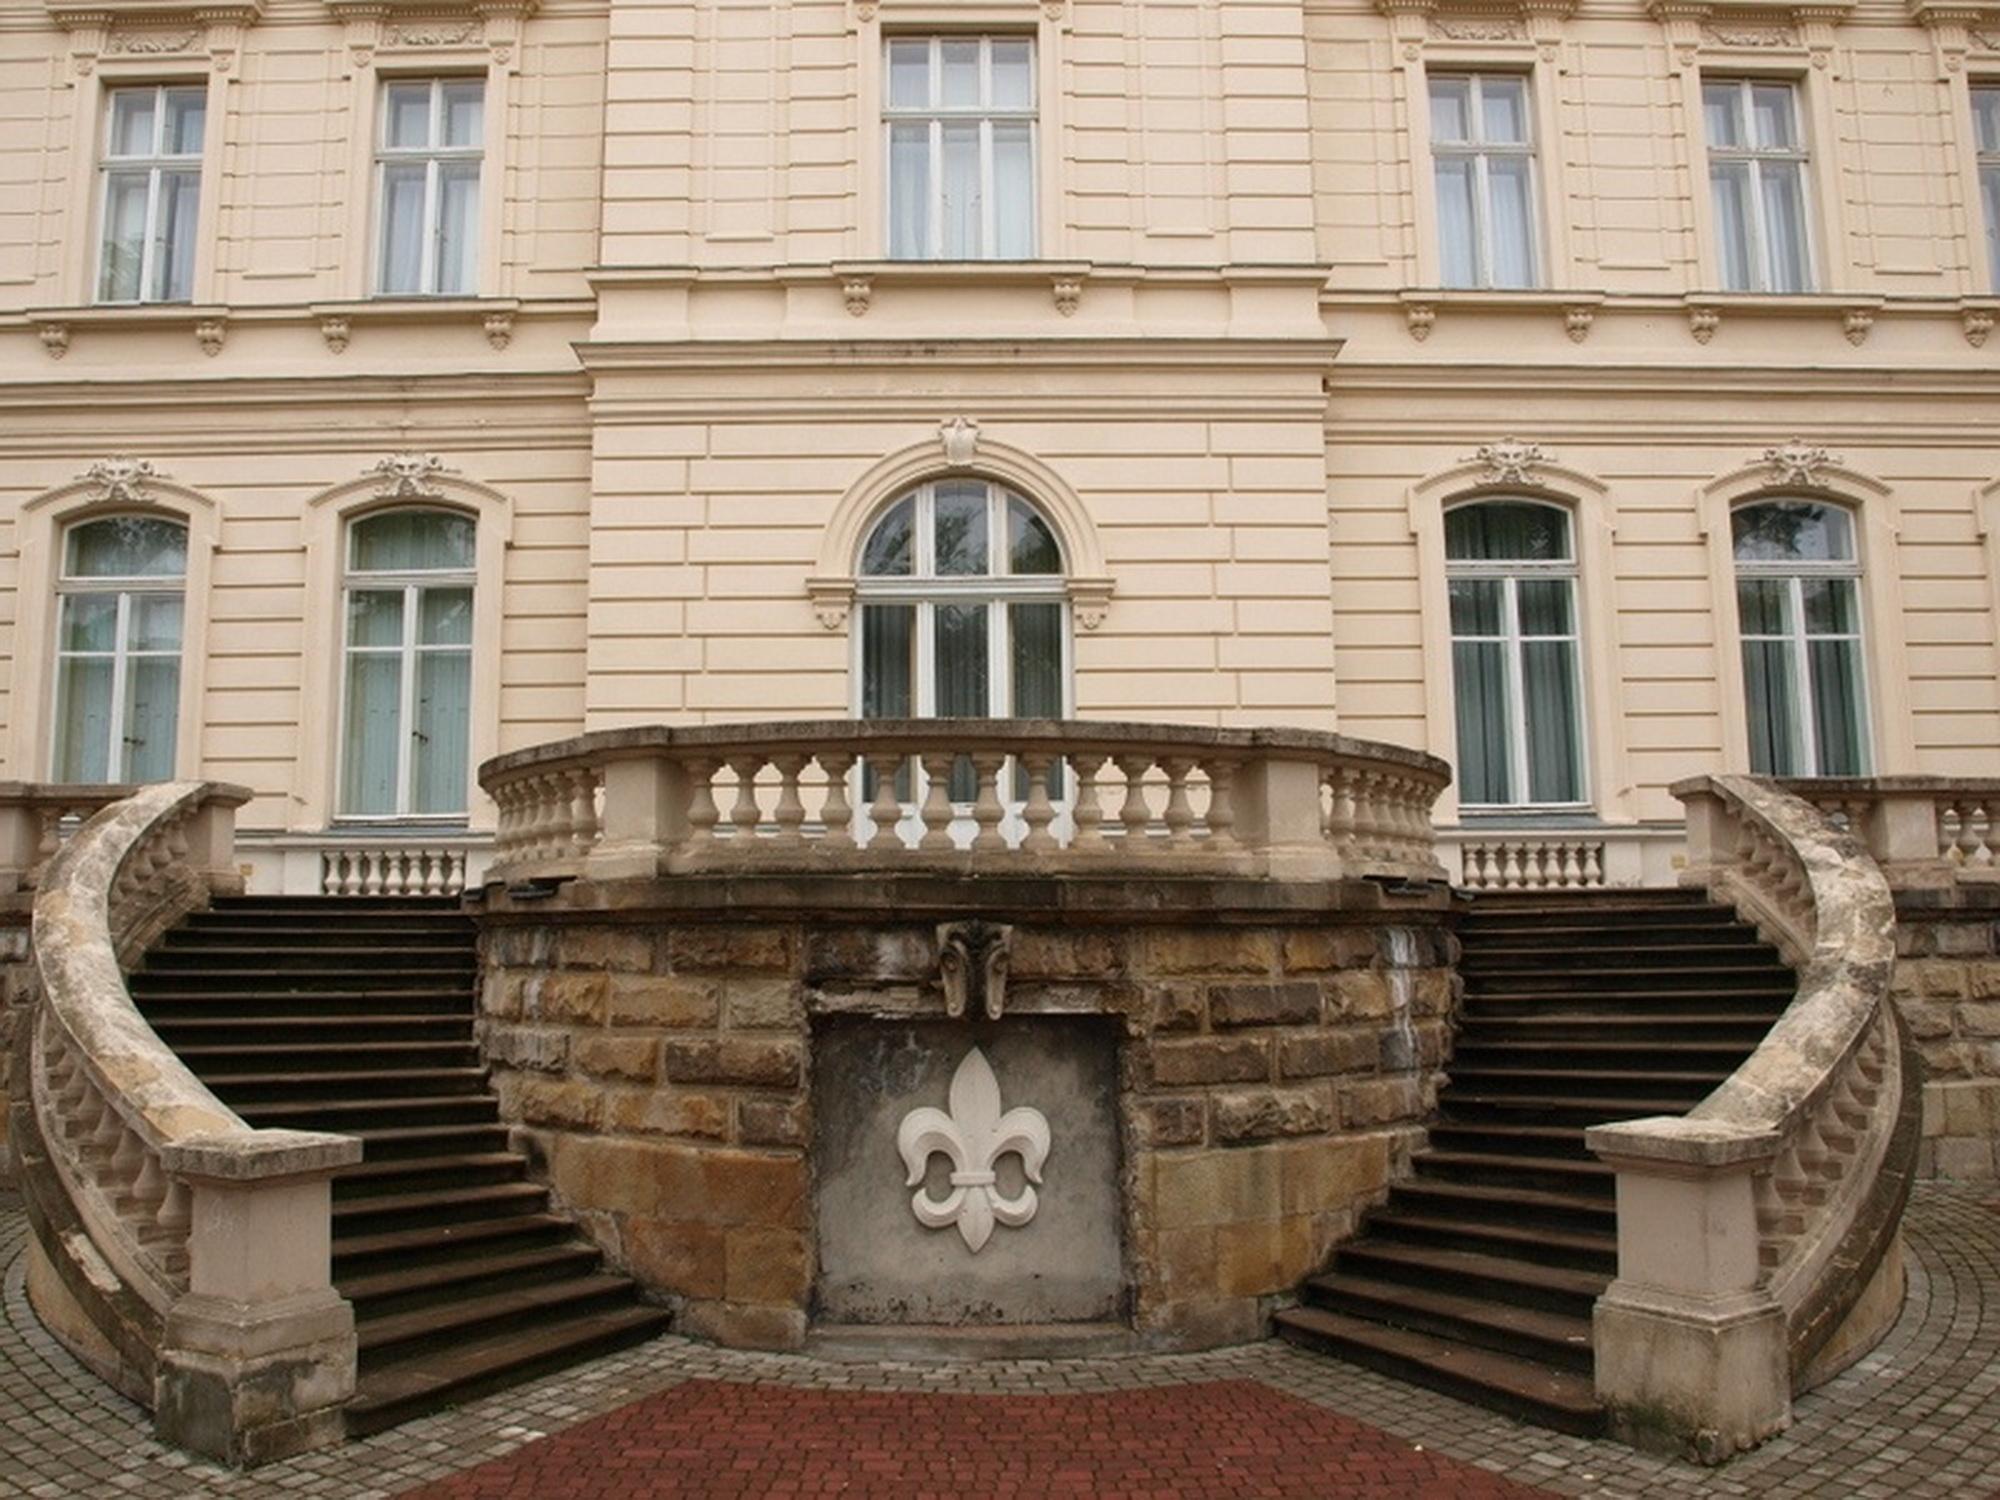 Тераса зі сходами з внутрішньої сторони палацу © discoverukraine.com.ua